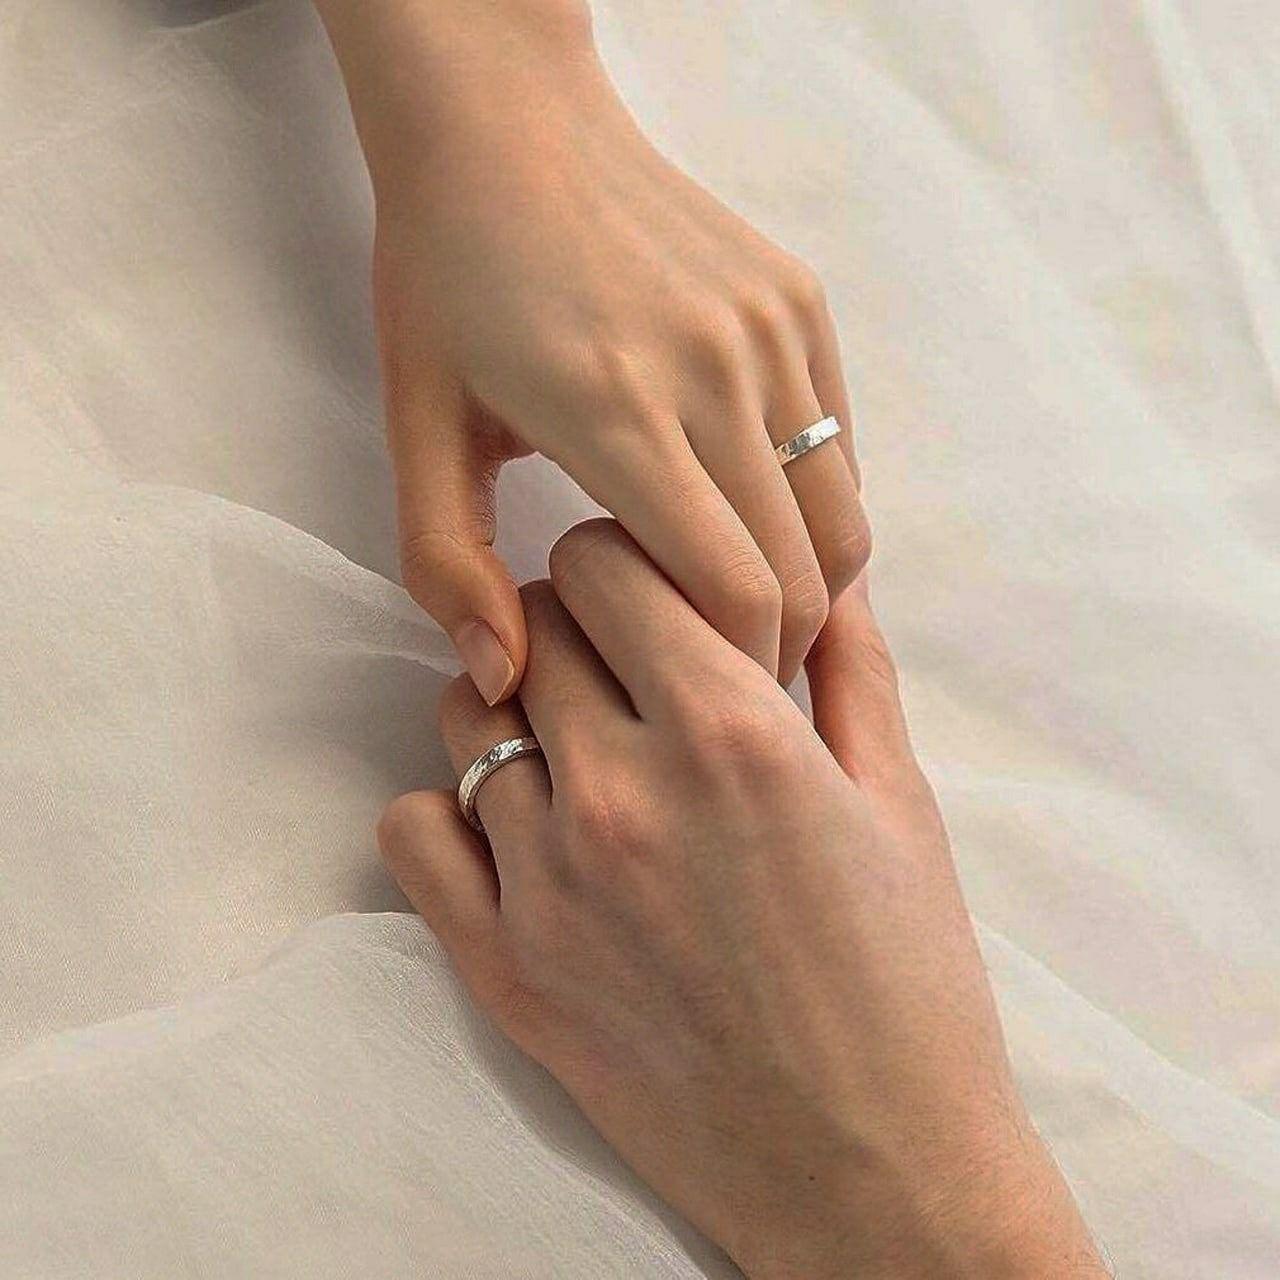 Pin By Marta Pokotylo On White Aesthetics In 2020 Couple Wedding Rings Ulzzang Couple Wedding Ring Hand